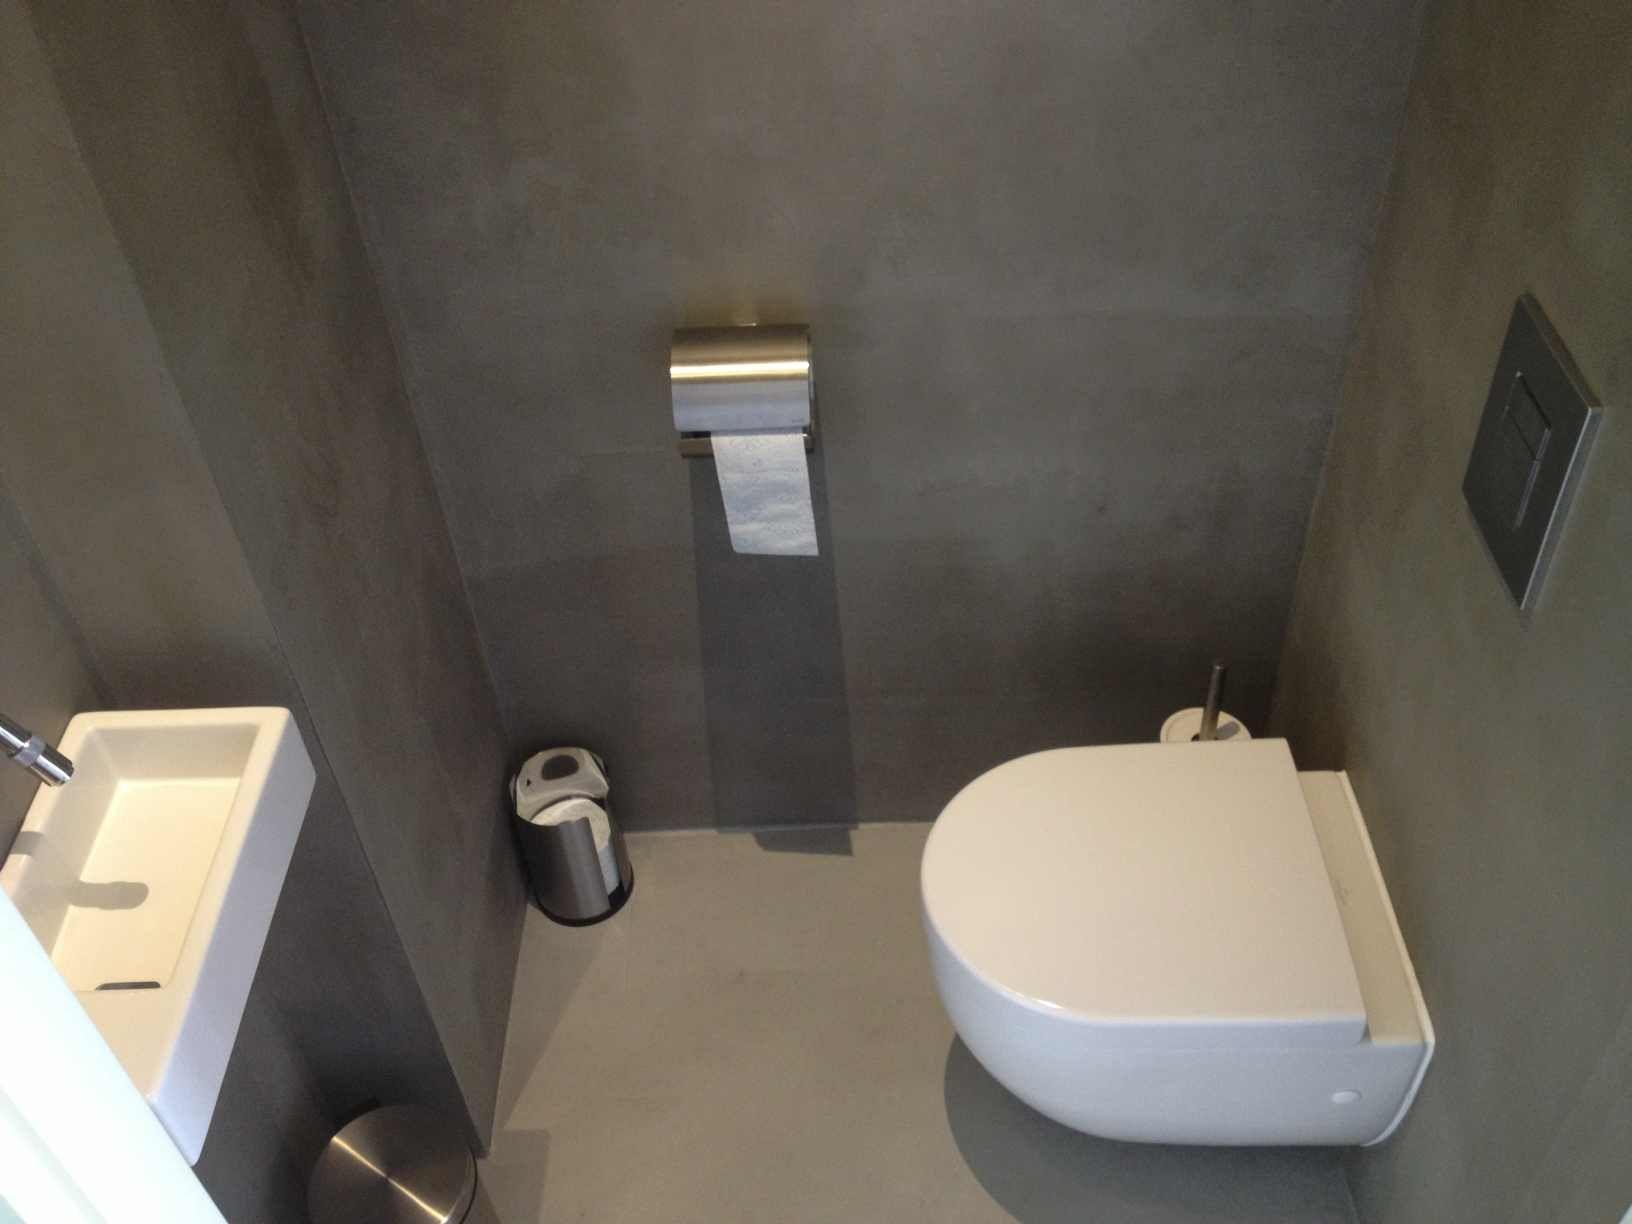 Beton cire keuken google zoeken ideeën badkamer